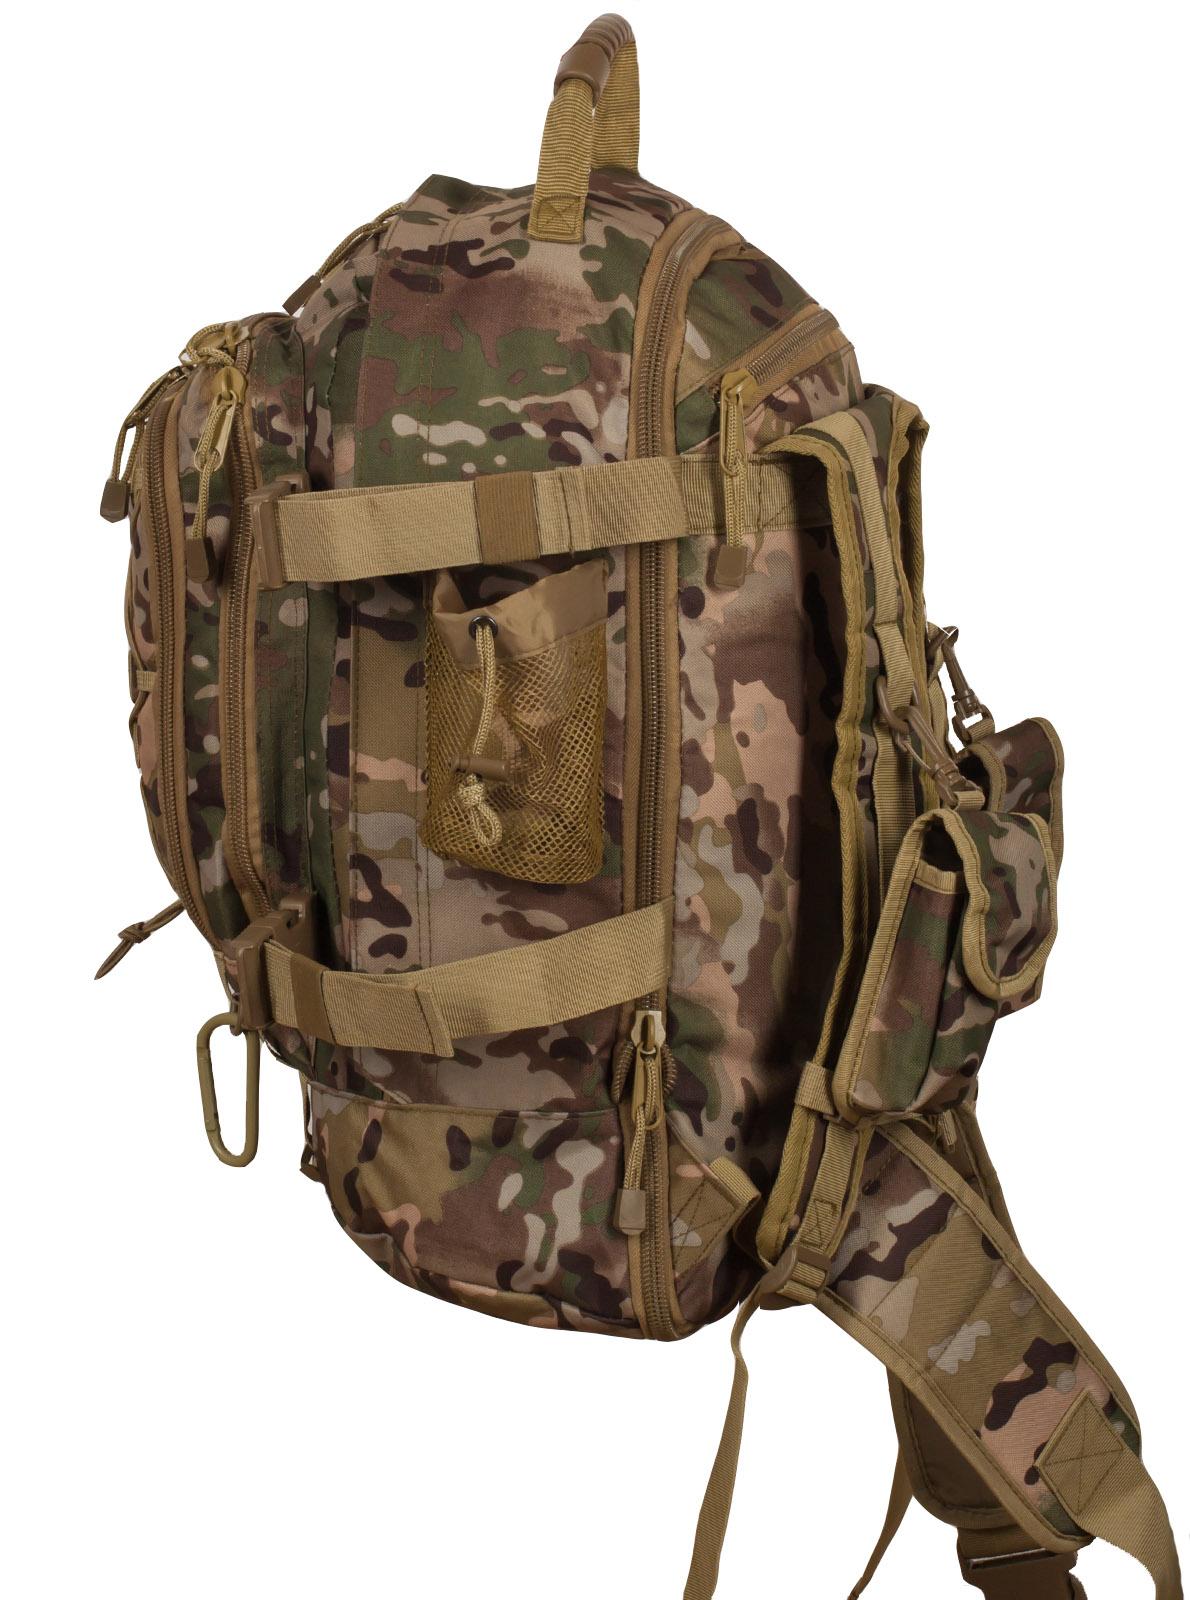 Рюкзак снайпера 3-Day Expandable Backpack 08002A Multicam с эмблемой МВД заказать в Военпро